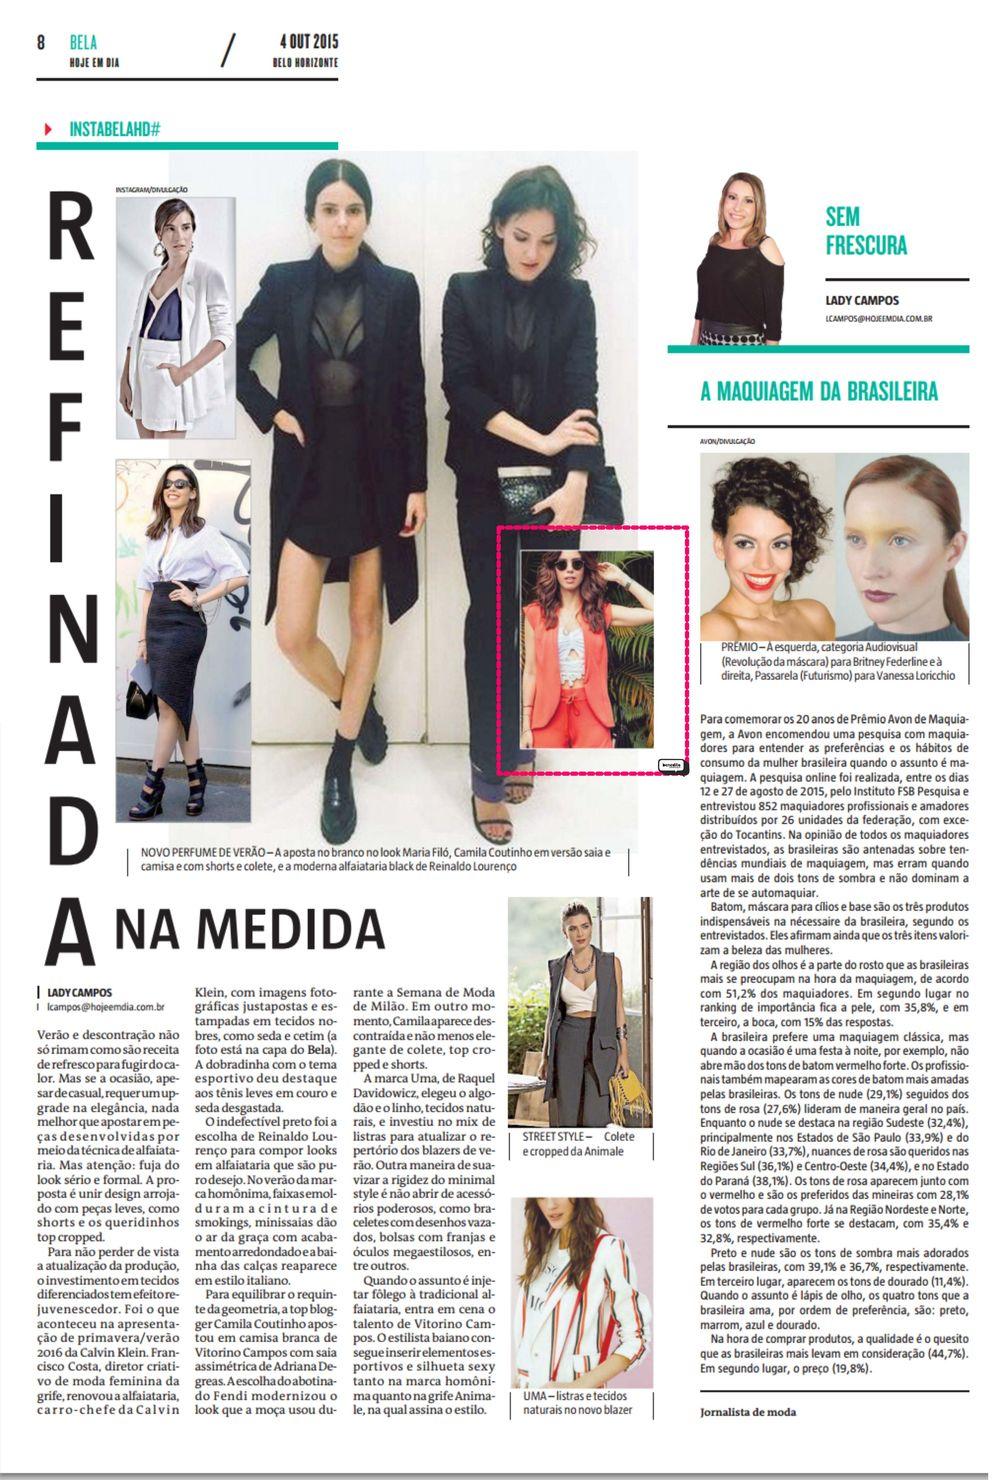 Cajo - Jornal Hoje em Dia - 04-10-2015.jpg